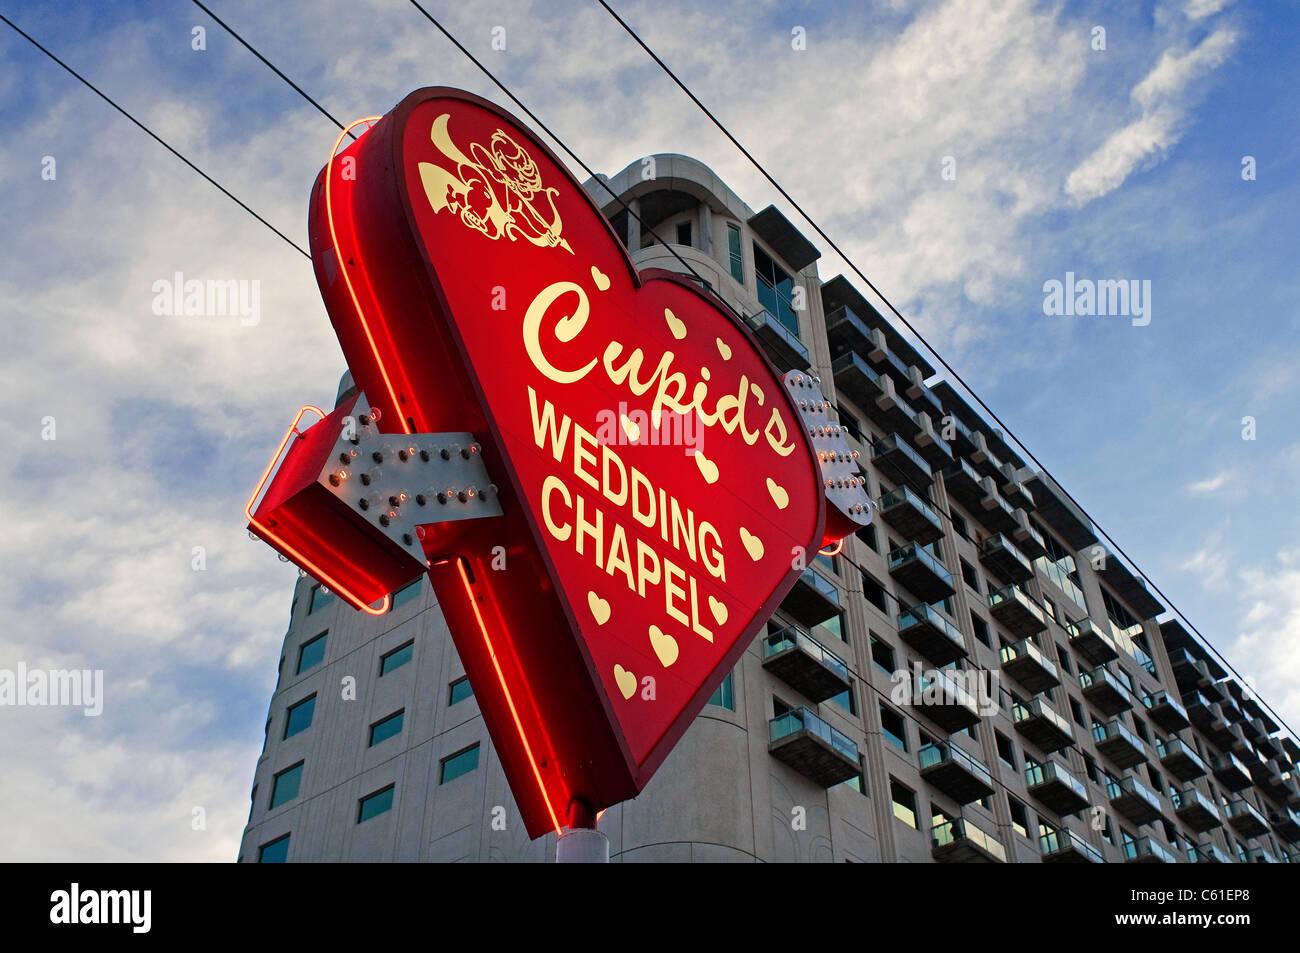 Wedding Chapel Cupids Las Vegas NV Nevada Imagens de Stock